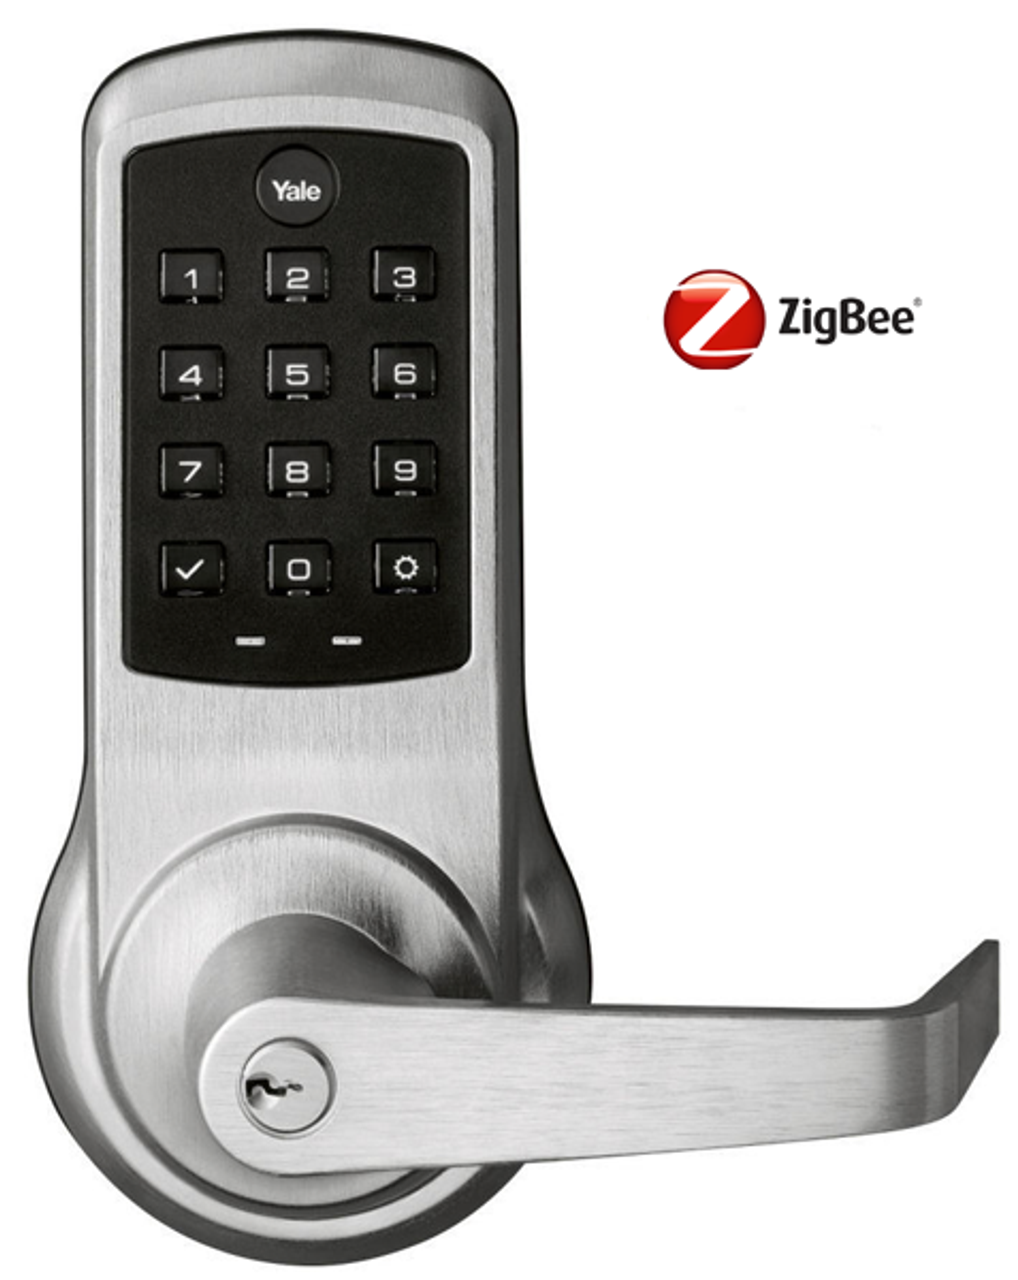 Yale Nextouch Au Ntb610 Ha2 2802 613e Zigbee Pushbutton Lock